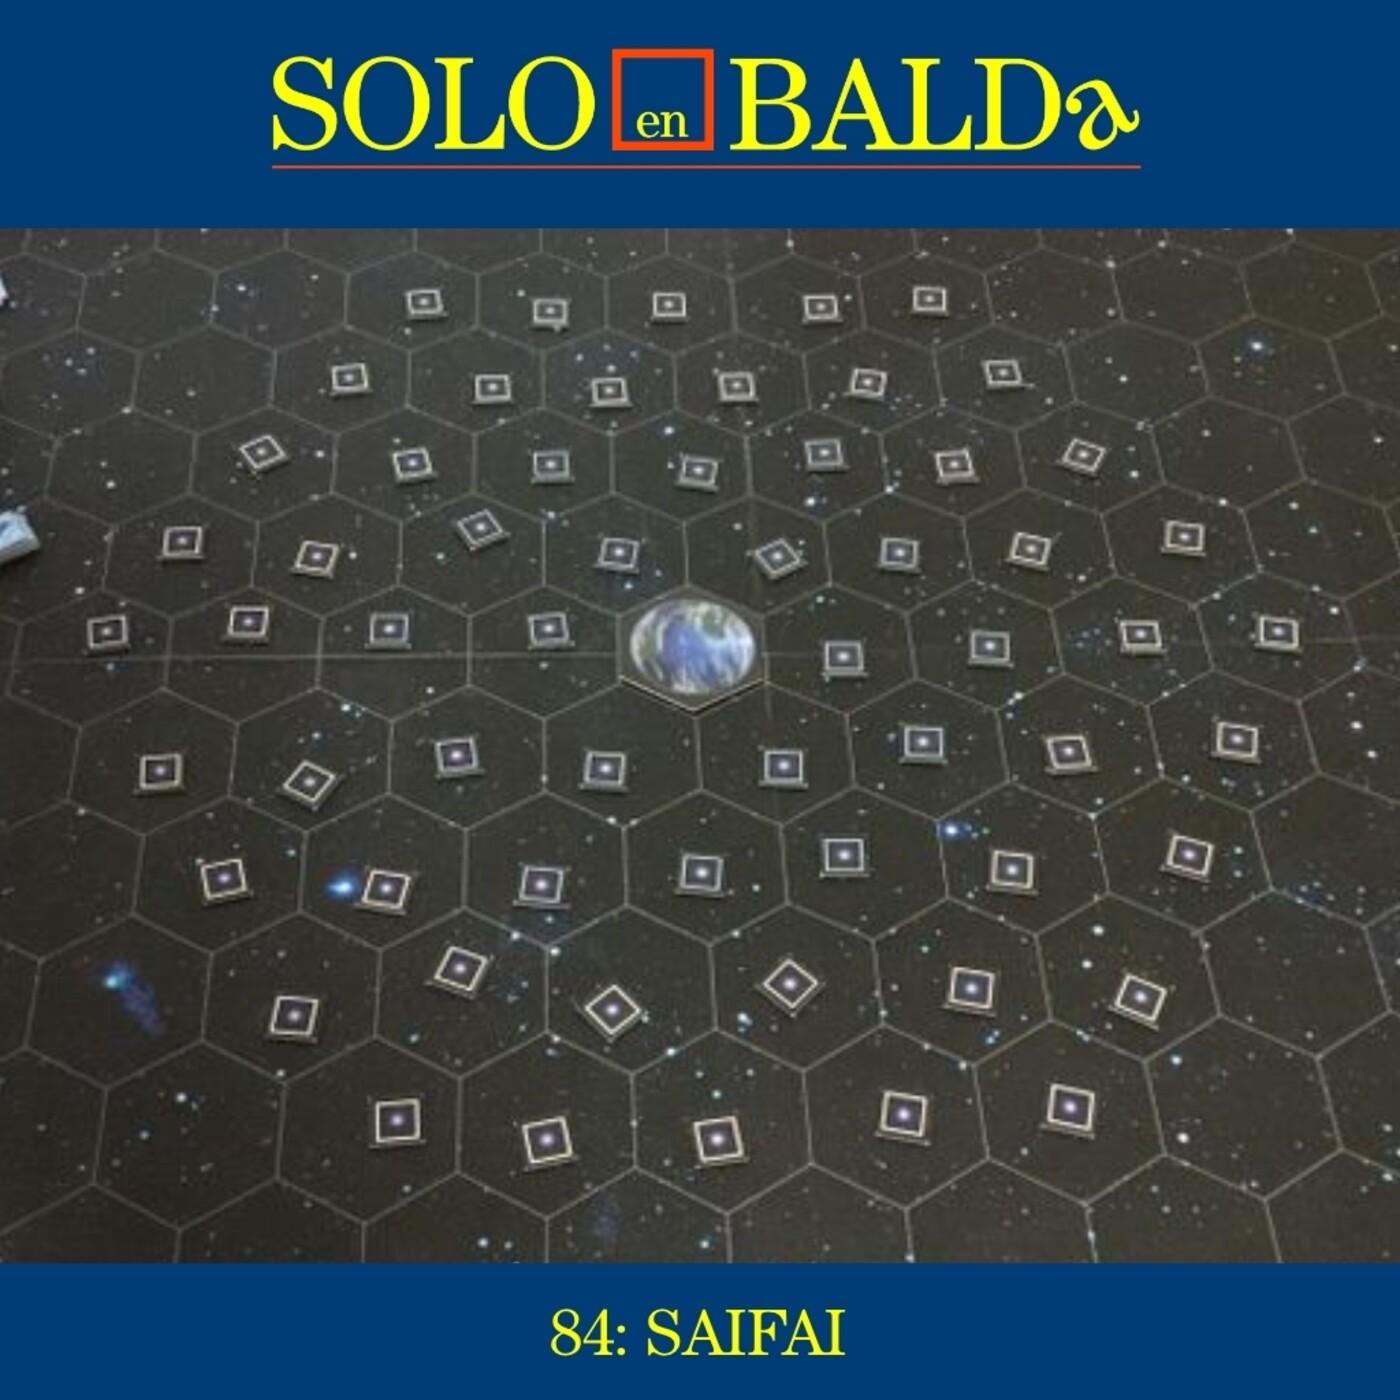 84: Saifai